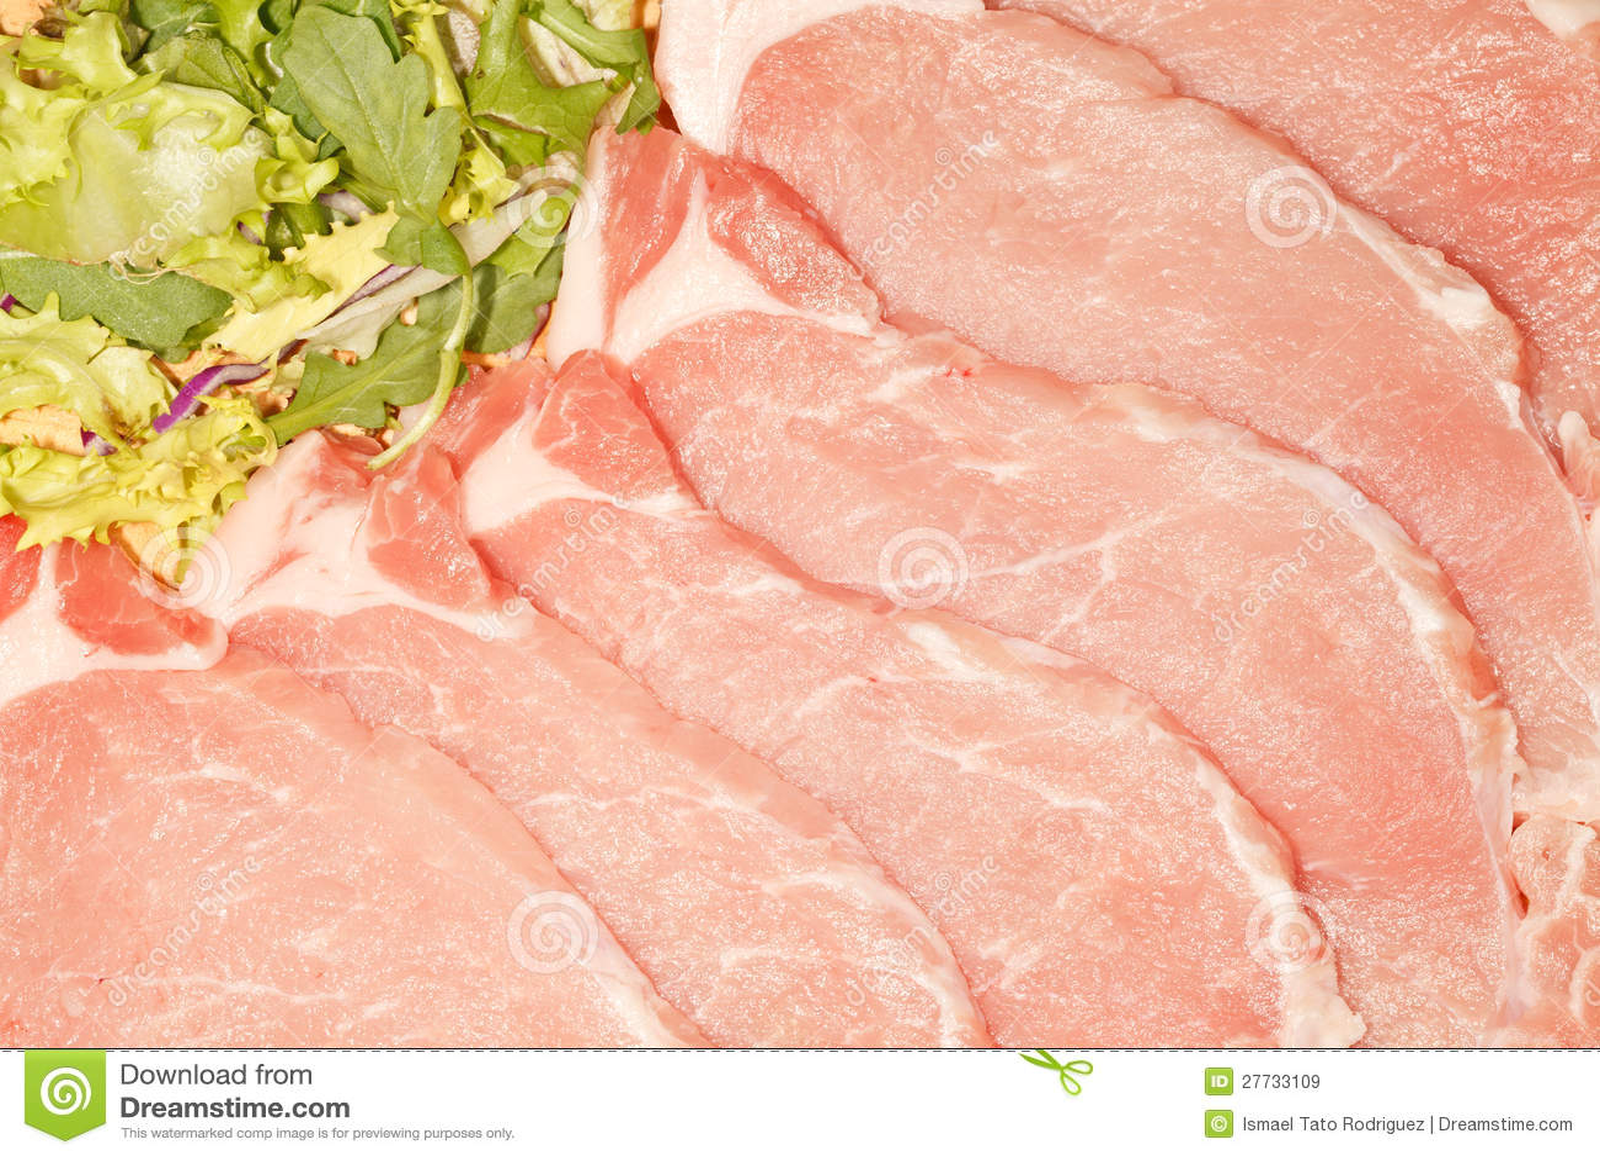 Frische Lende-Steaks